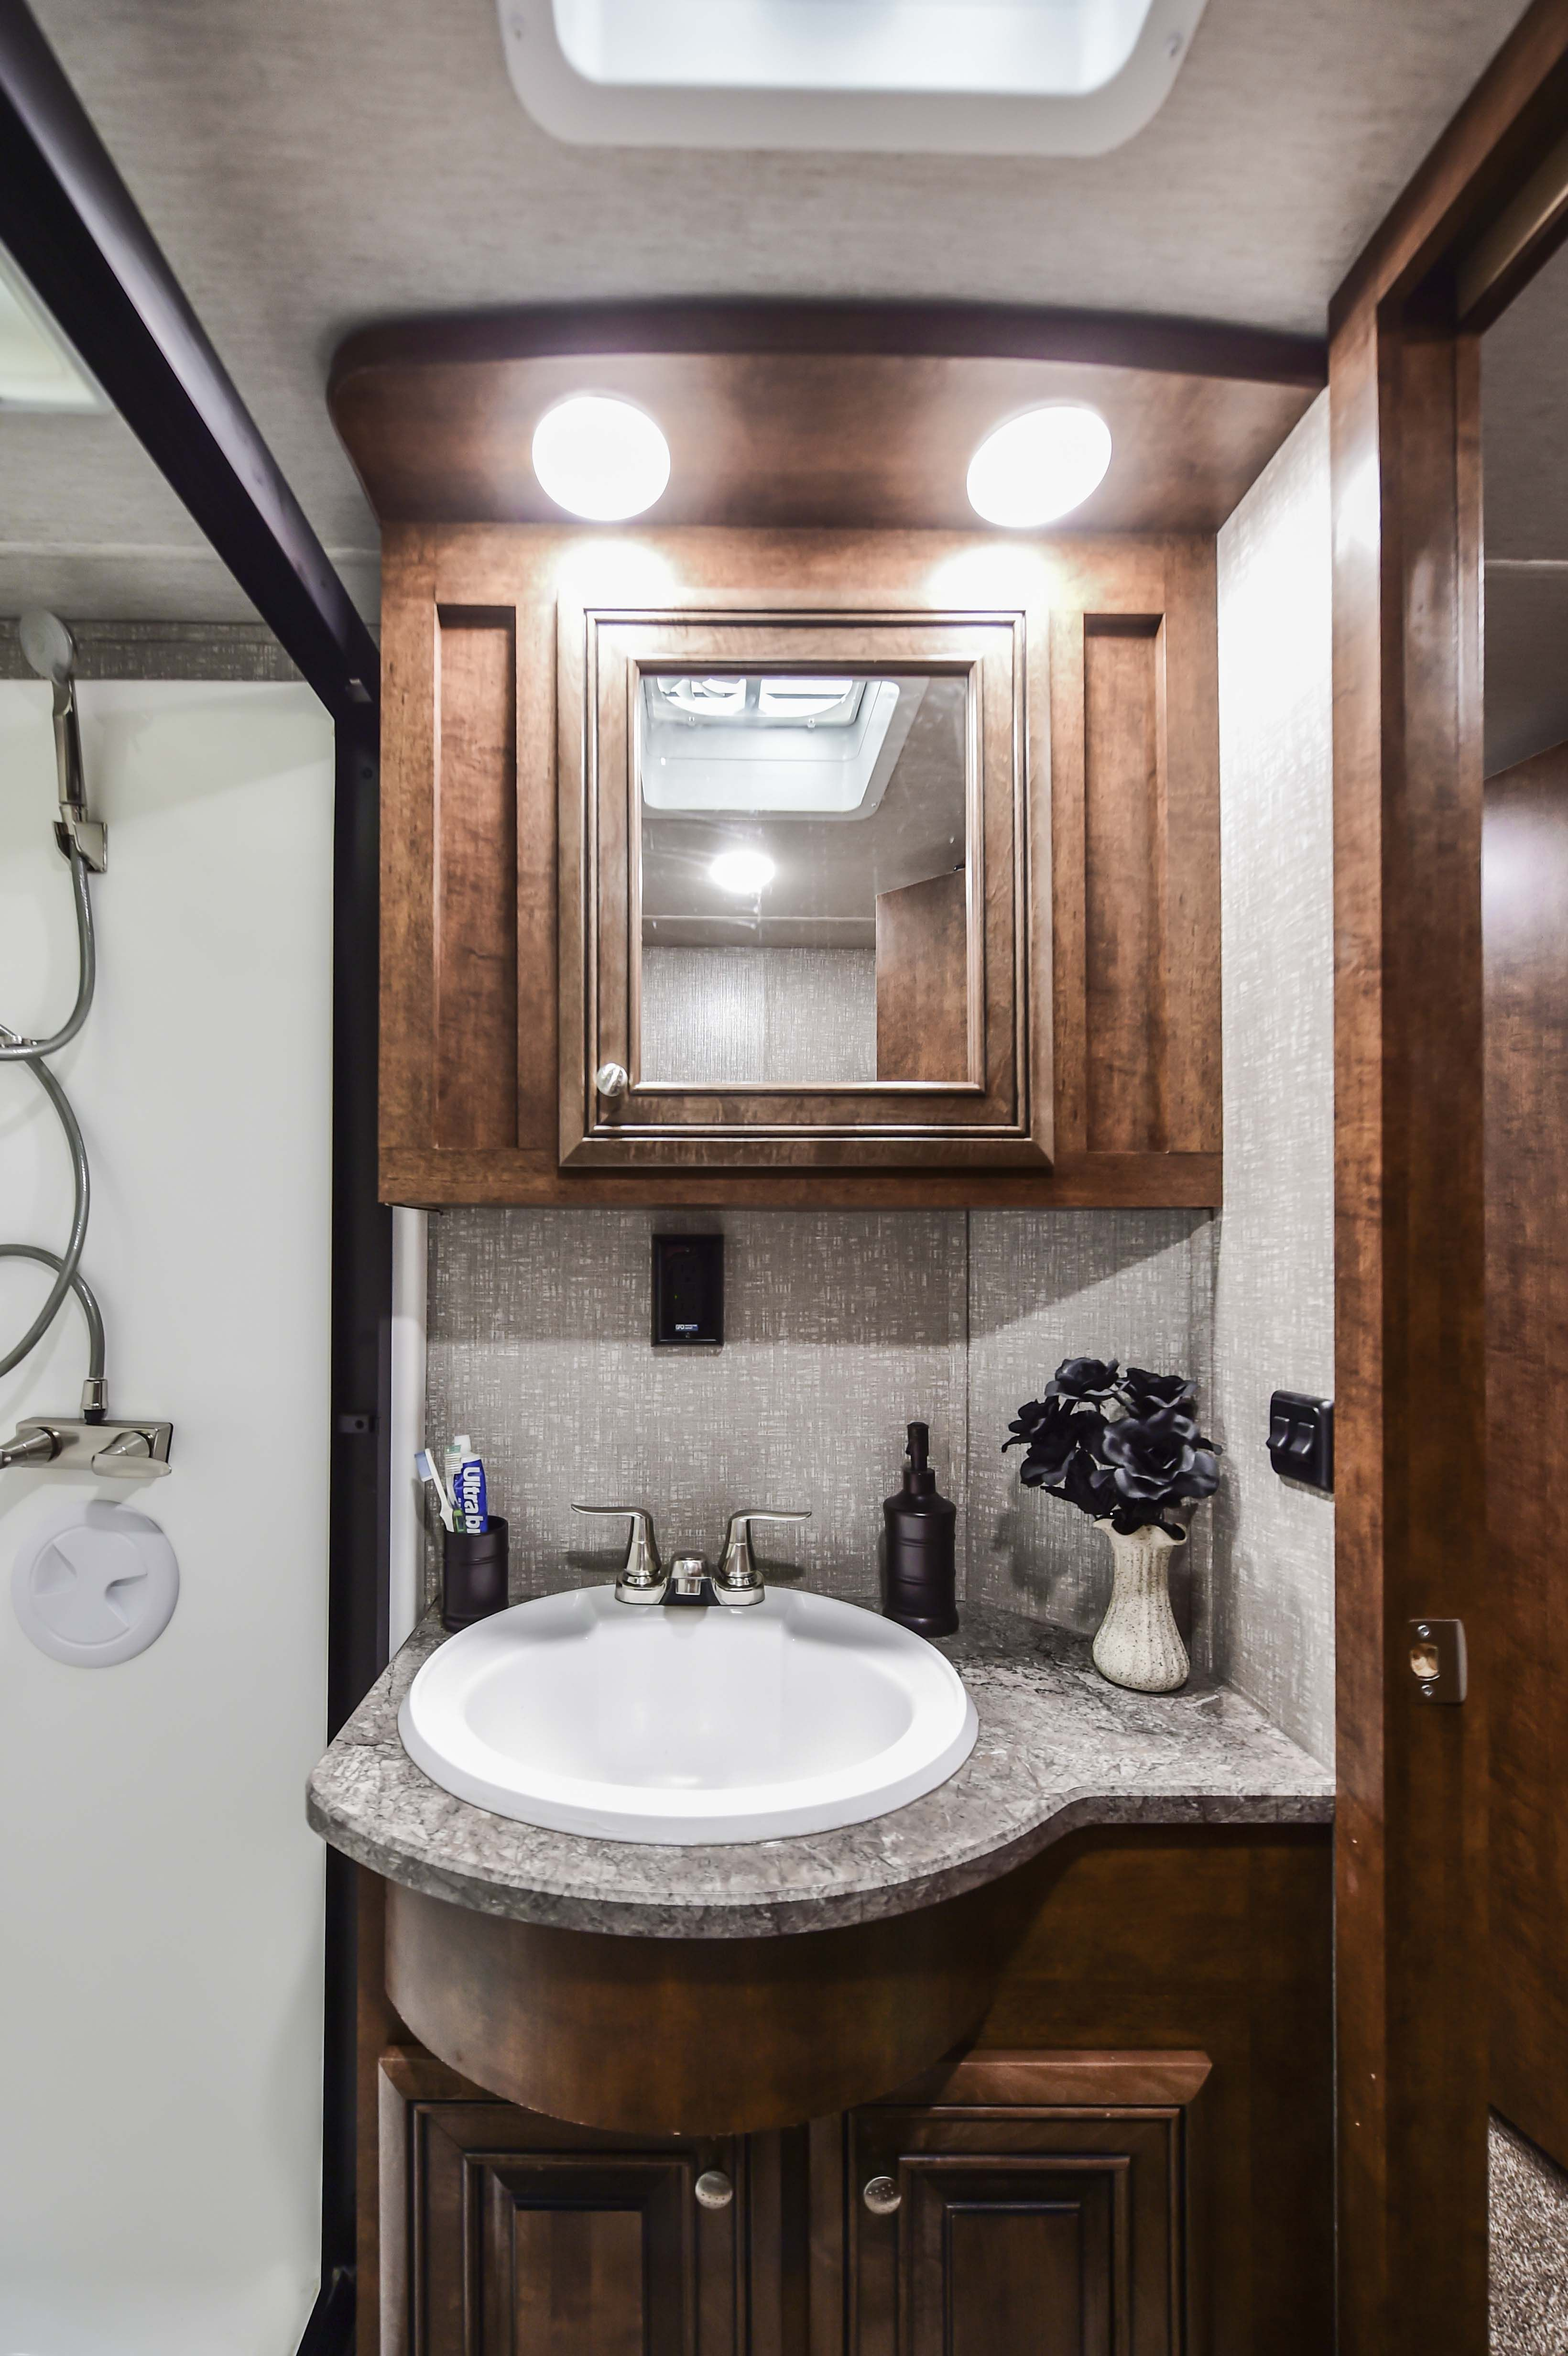 Bighorn Traveler 39 Mb Fifth Wheel Bathroom Vanity Bathroom Vanity Lighting Bathroom Design